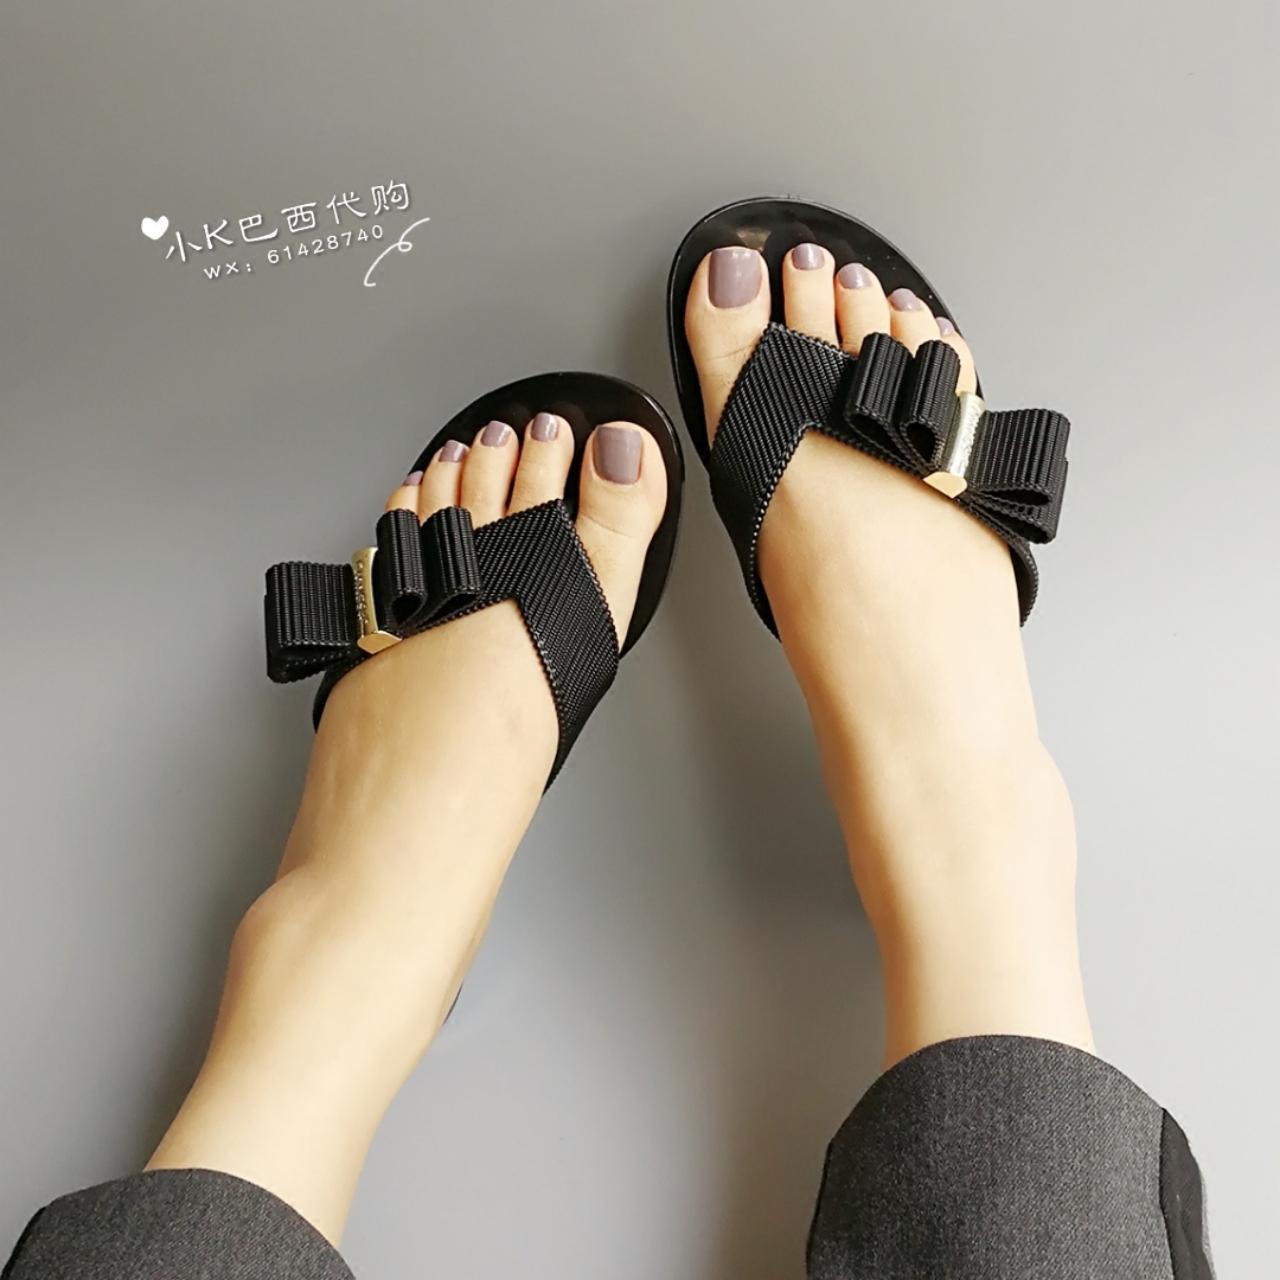 4500295c351bf 2018 new Brazil buy melissa jason wu Melissa bow shoes slippers flip flops